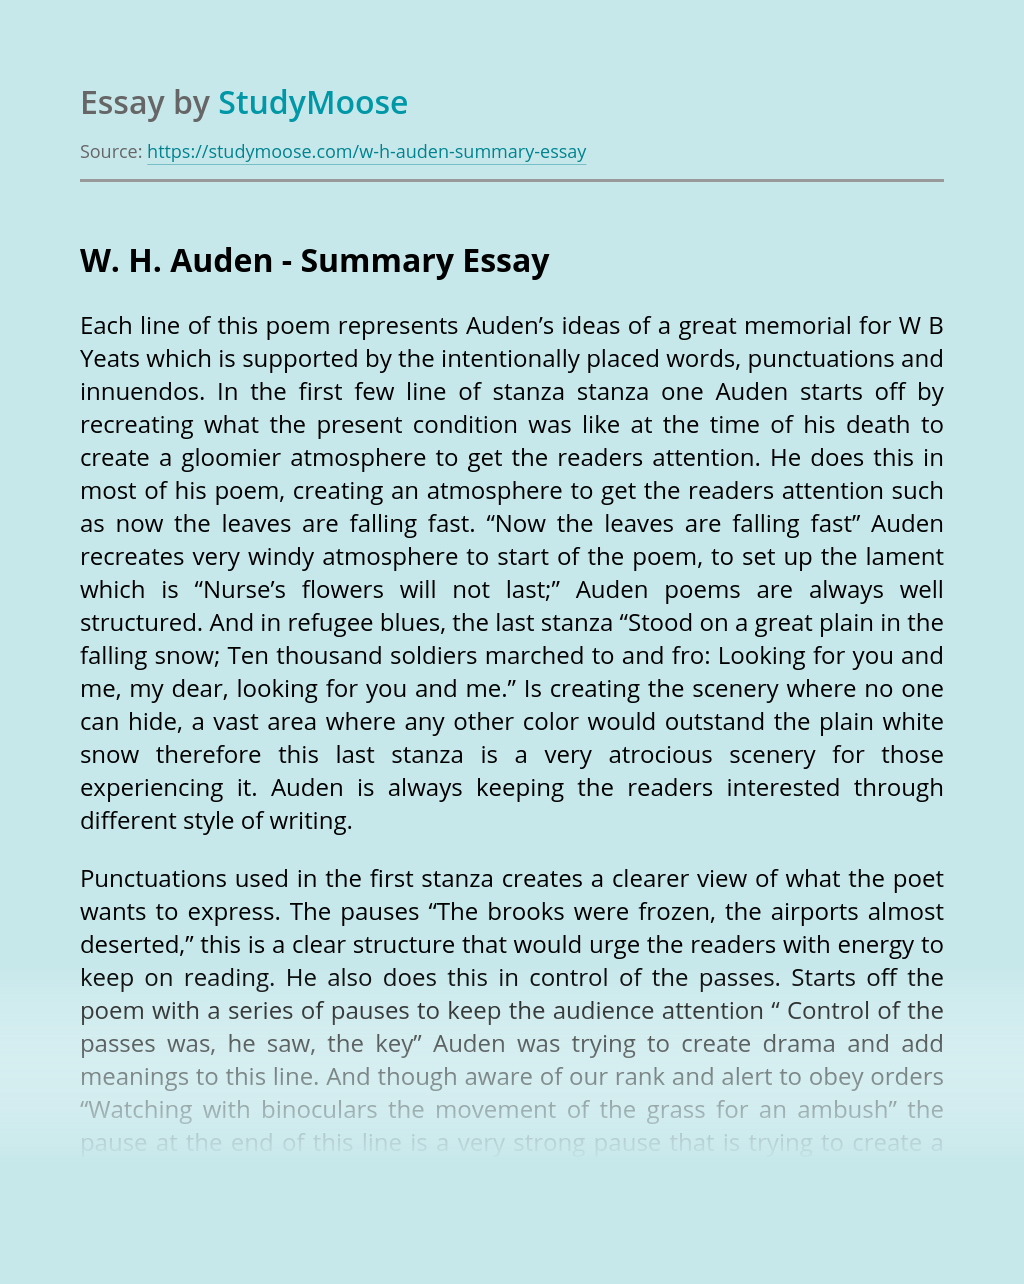 W. H. Auden - Summary